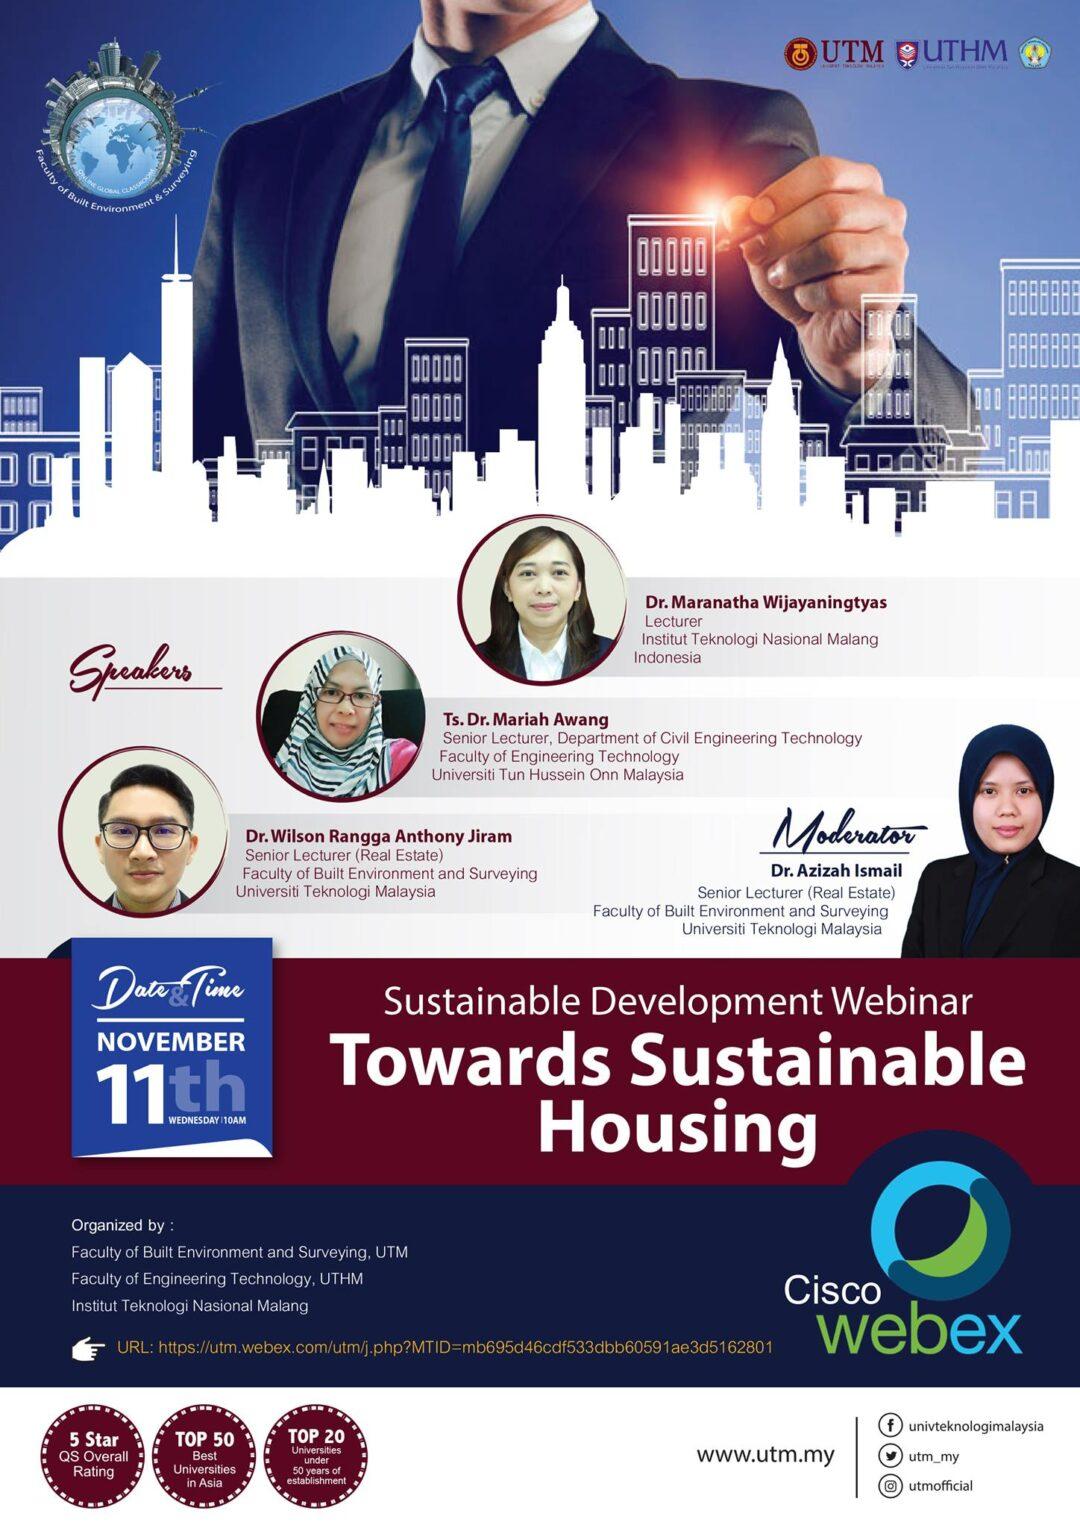 Sustainable Development Webinar: Towards Sustainable Housing